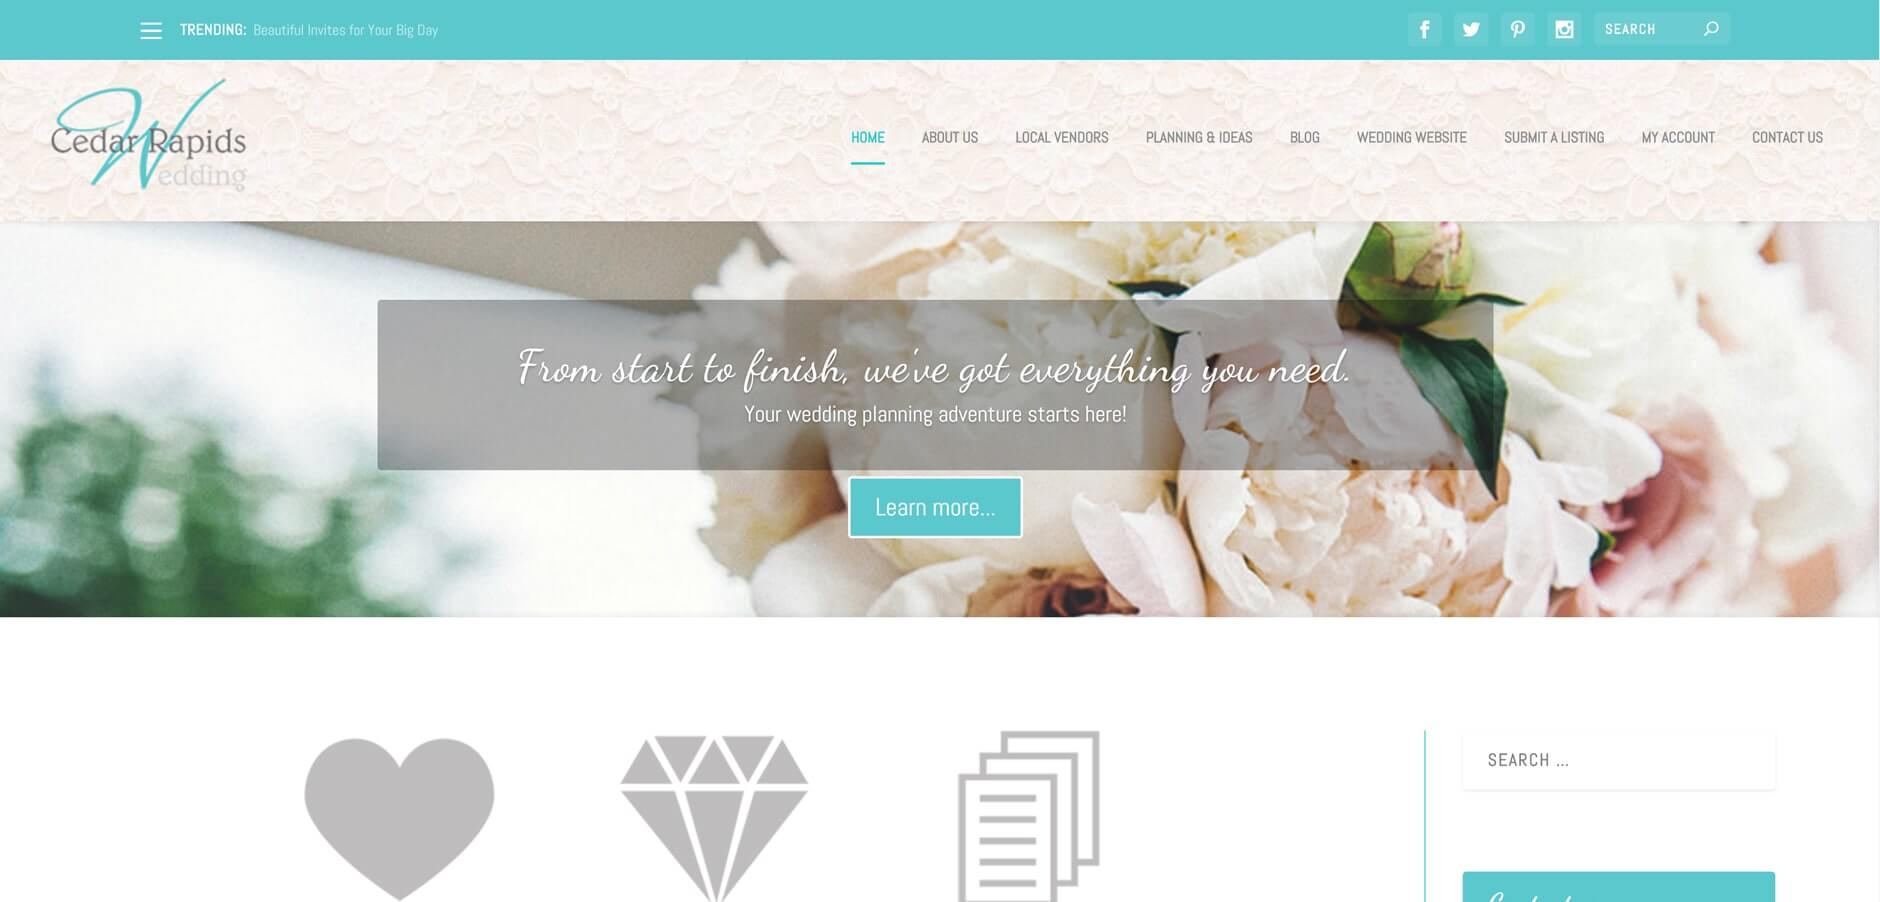 CR Wedding Full Website Creation 1 CR Wedding Full Website Creation